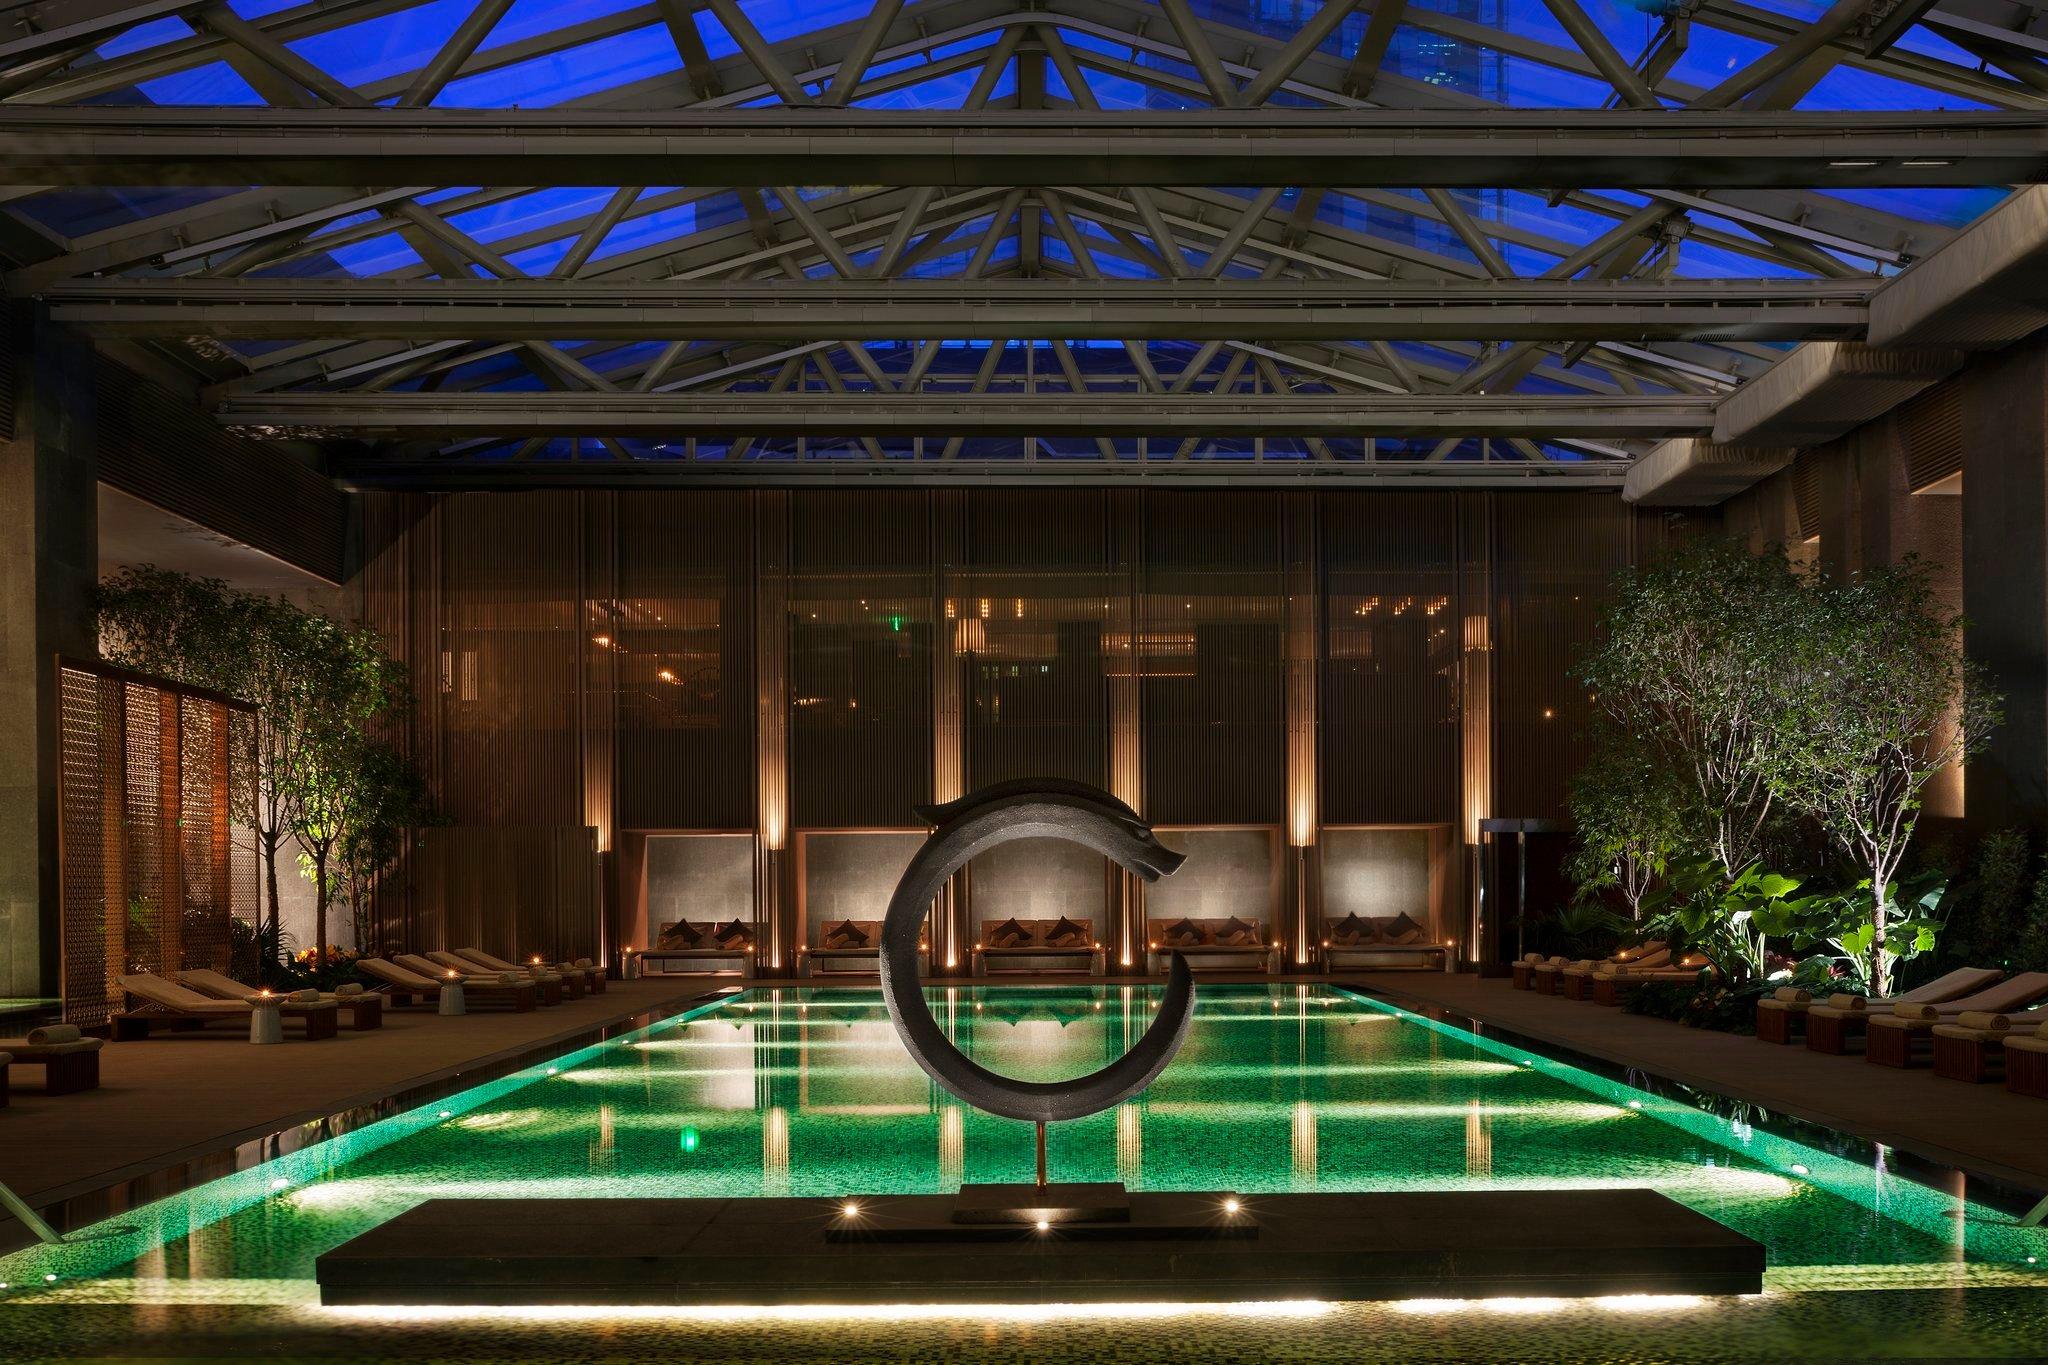 The Rosewood, Beijing's rejuvanating green pool